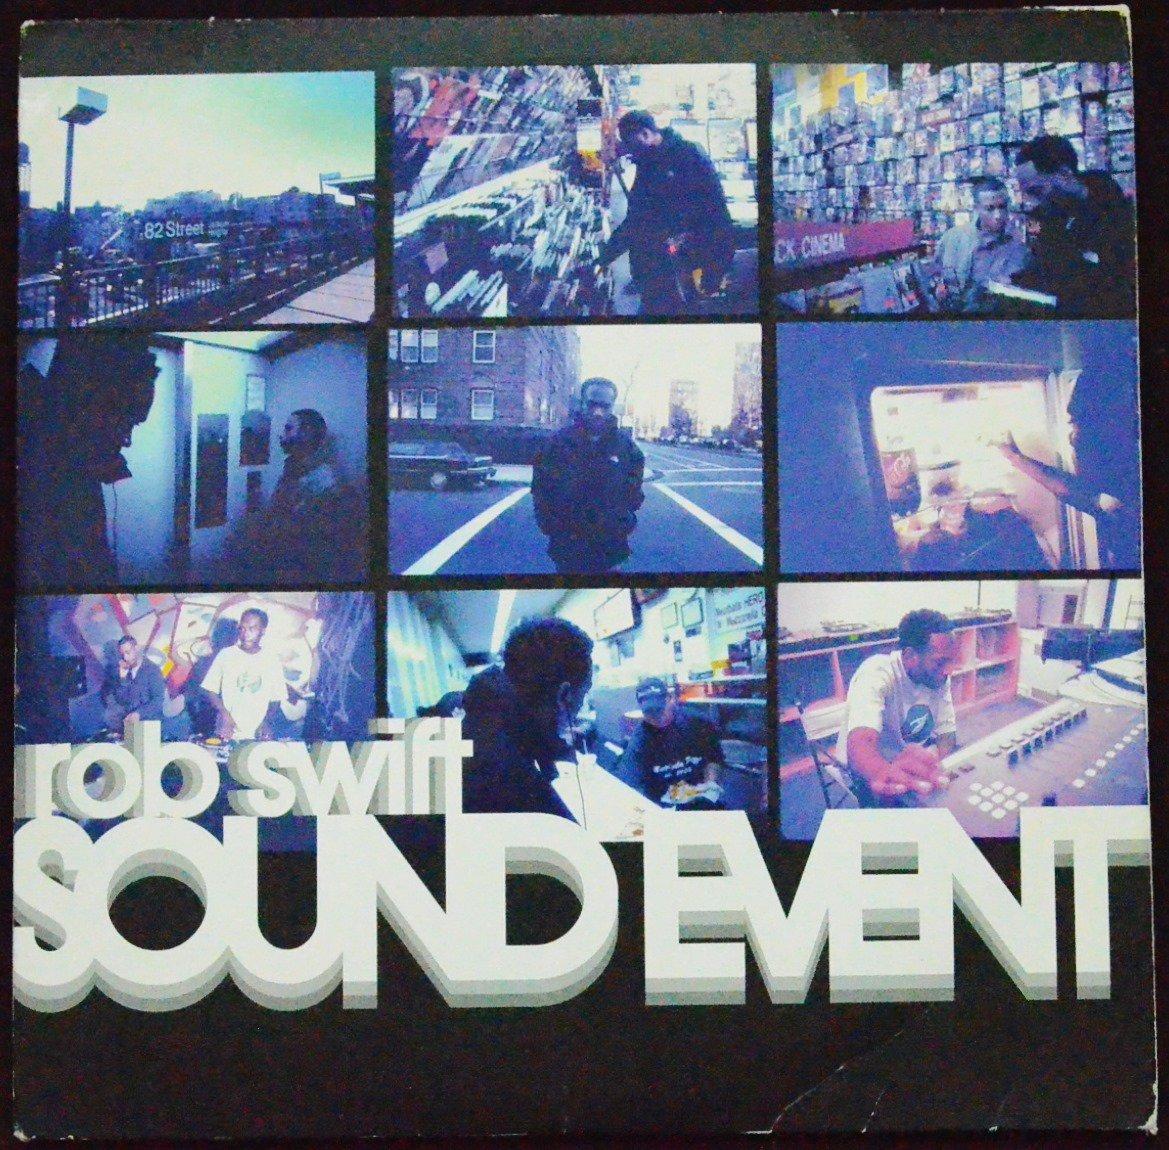 ROB SWIFT / SOUND EVENT (2LP)